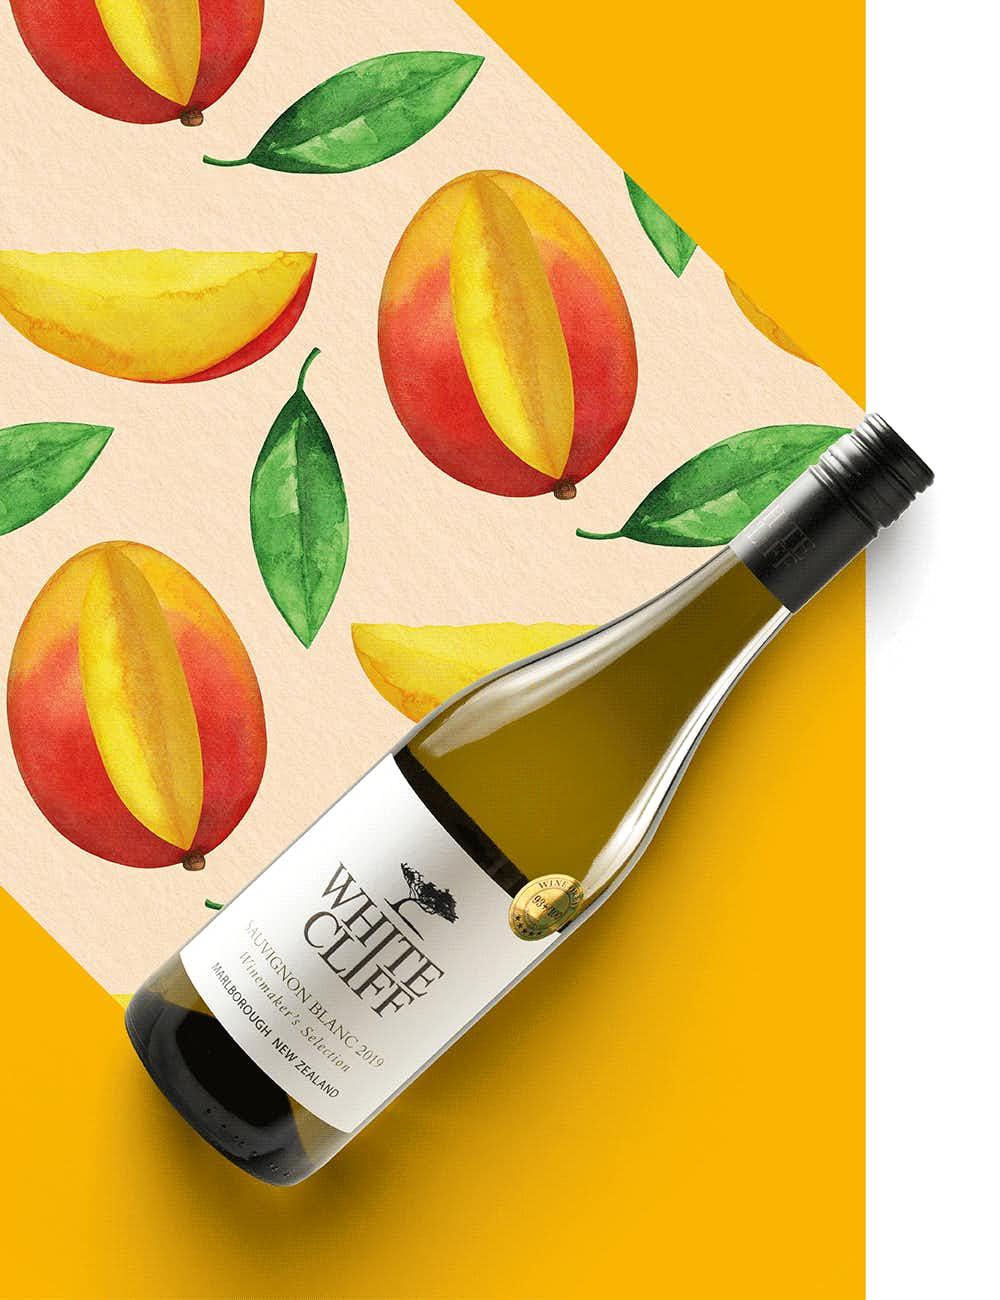 Whitecliff Wines Winemaker's Selection Sauvignon Blanc 2019